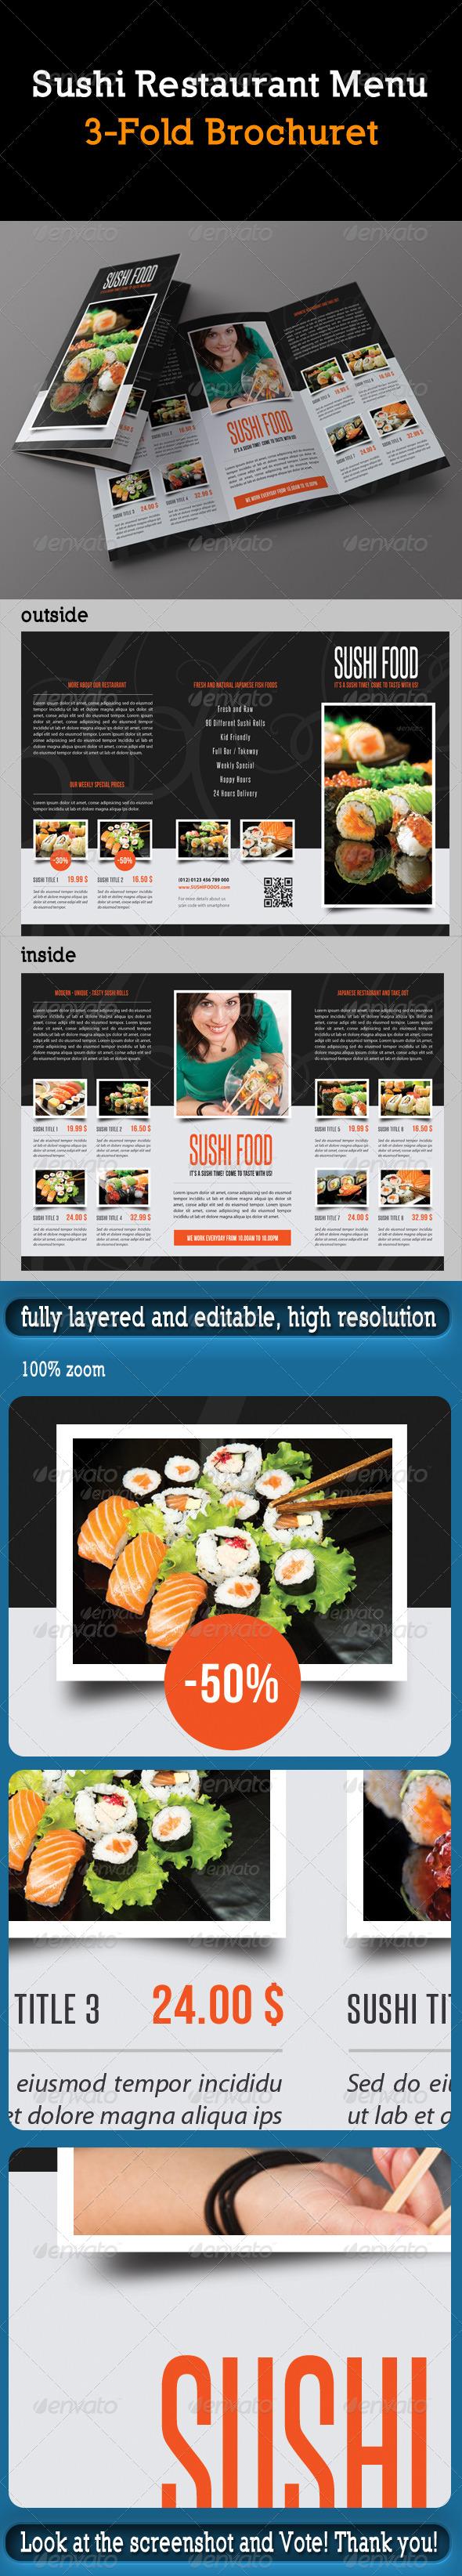 GraphicRiver Sushi Restaurant Menu 3-Fold Brochure 8374527